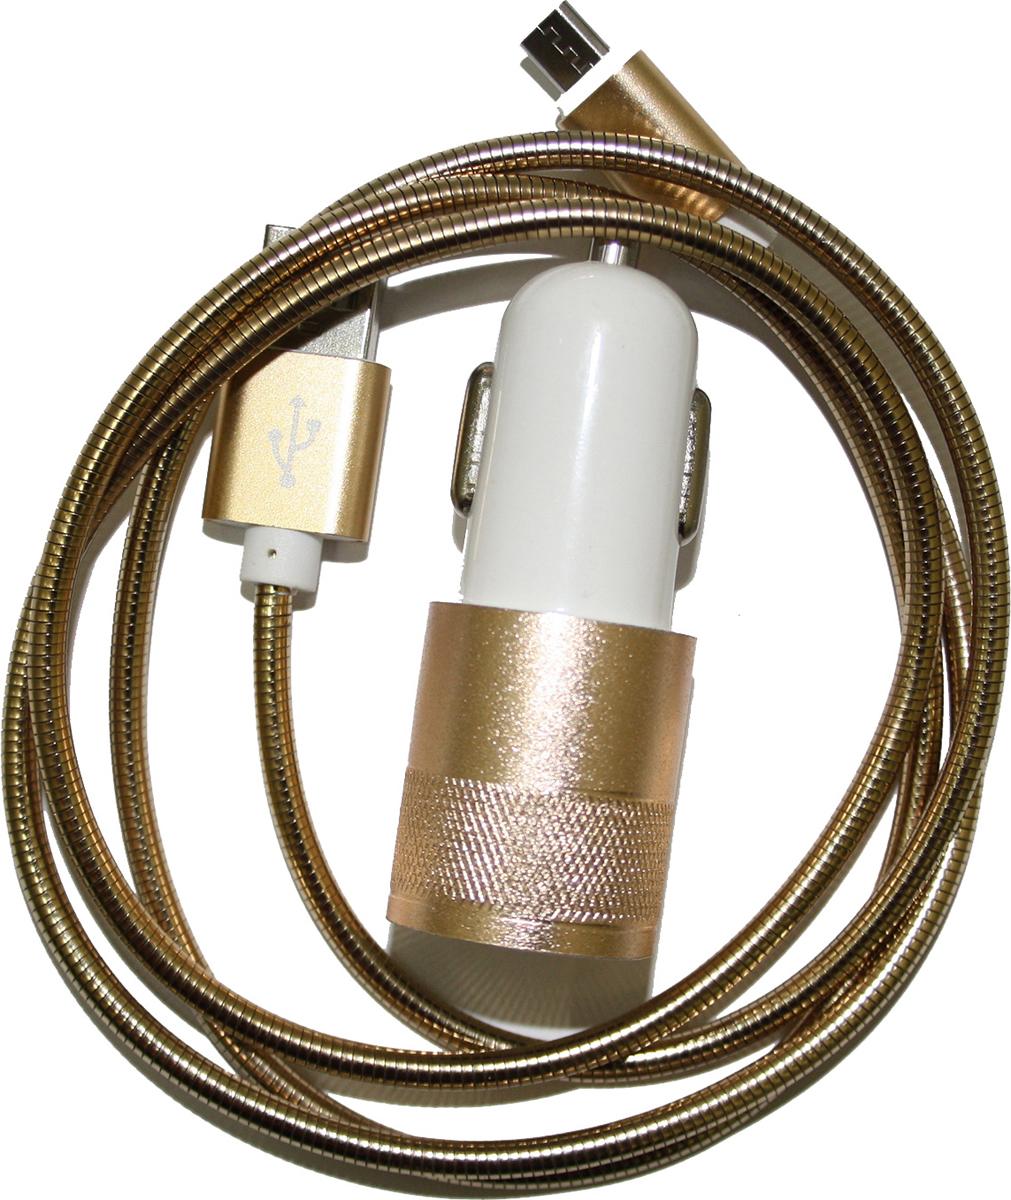 Розетка прикуривателя AvtoVins AVTO VINS_7027530 автомобильное зарядное устройство belkin f8j186bt04 c00 кабель usb apple 8 pin розовый